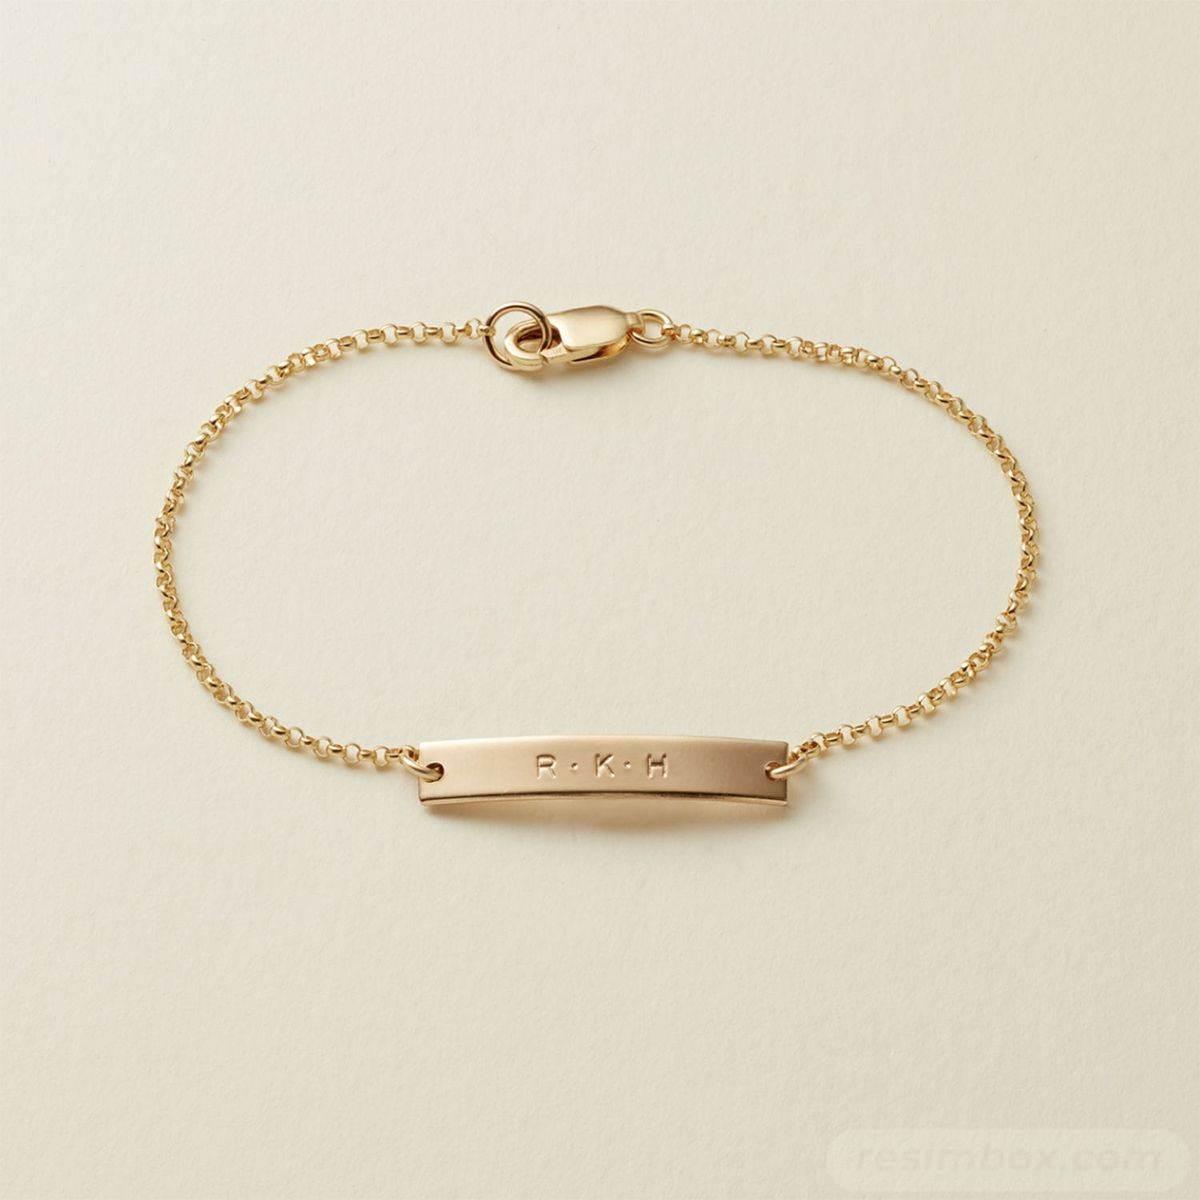 bars jewelry-375980268891553859